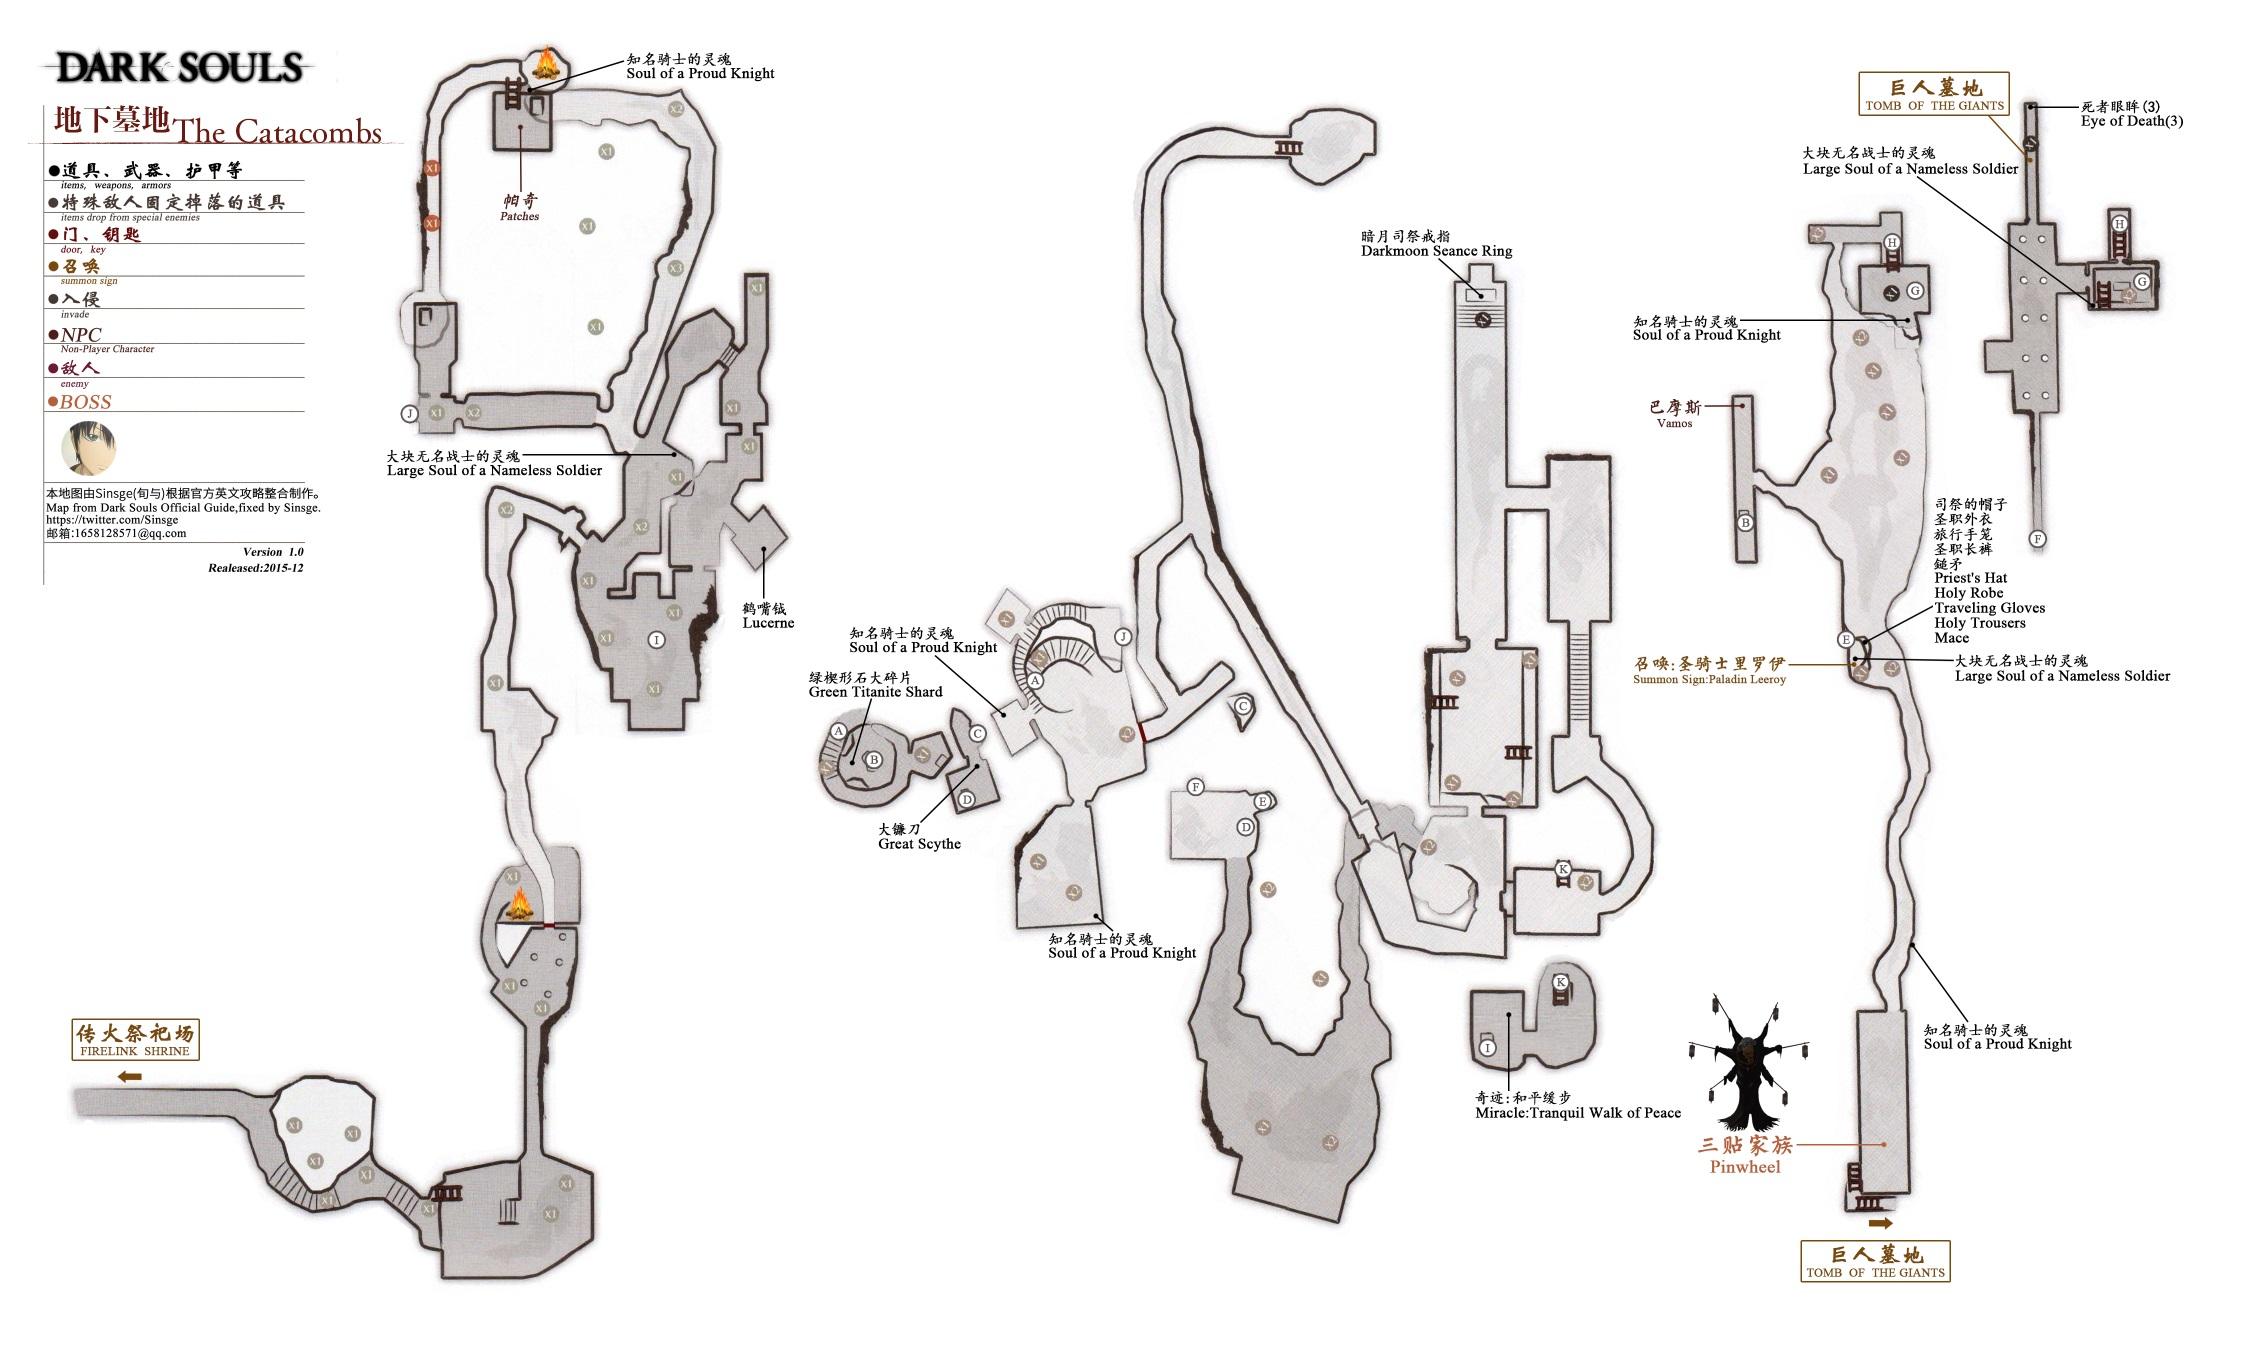 Steam Community :: Guide :: 【Dark Souls Detailed Map】黑暗之魂受